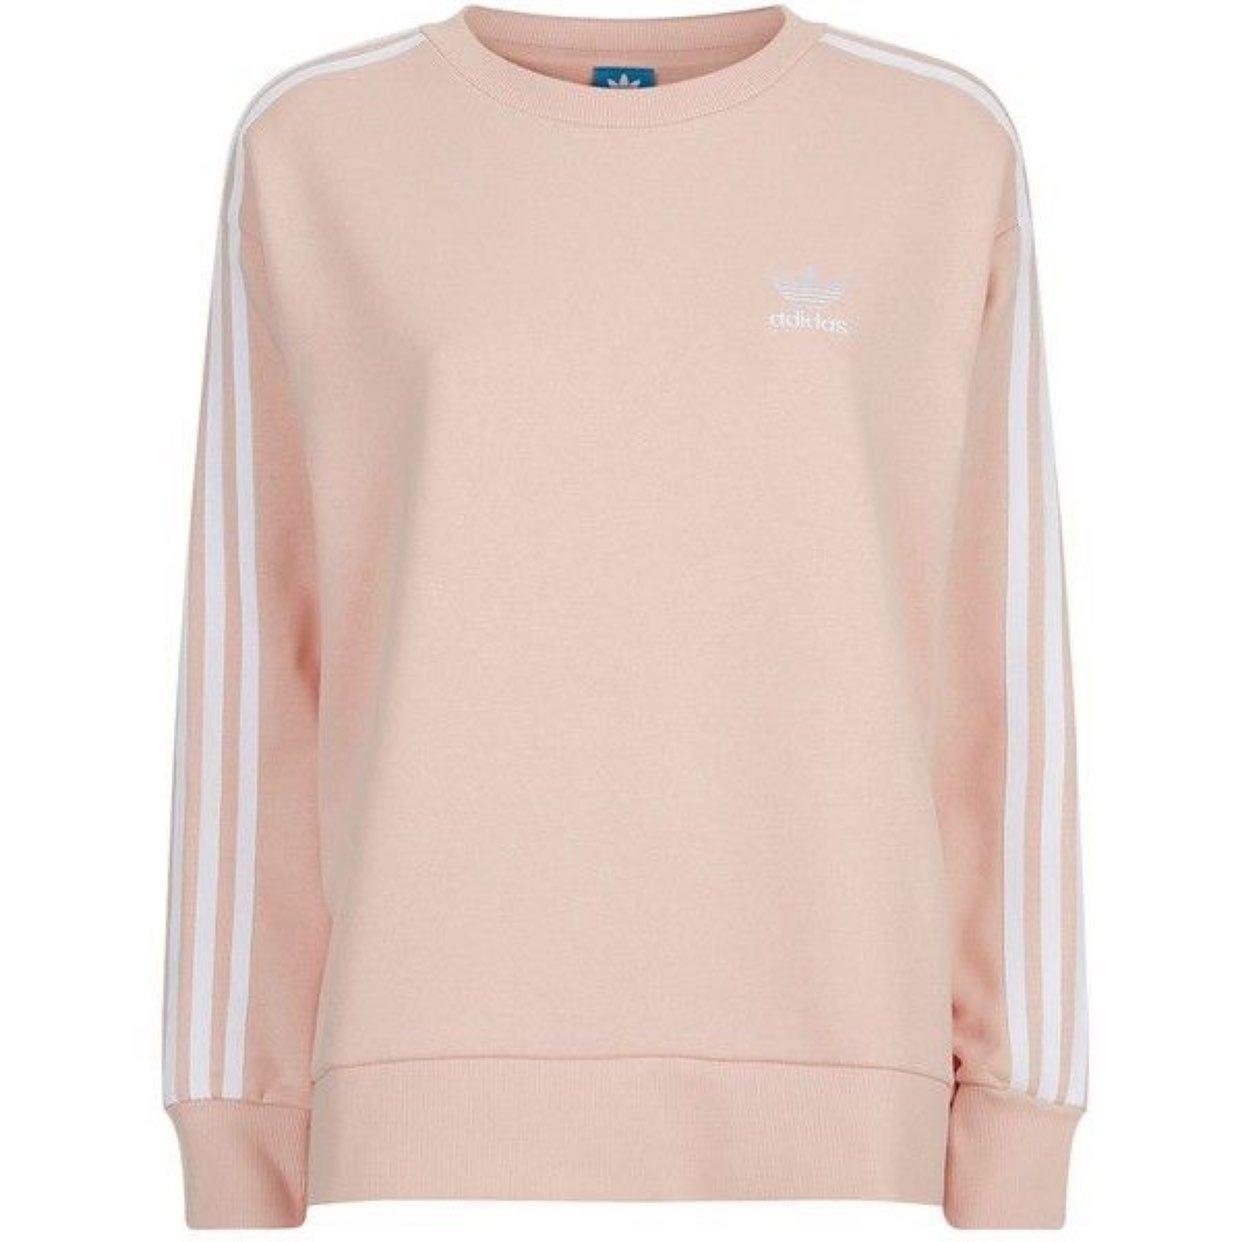 Desprecio Afectar Mutuo  NWT Adidas Original 3 Stripe Crewneck on Mercari | Sweatshirts, Adidas  sweatshirt, Pink crewneck sweatshirt